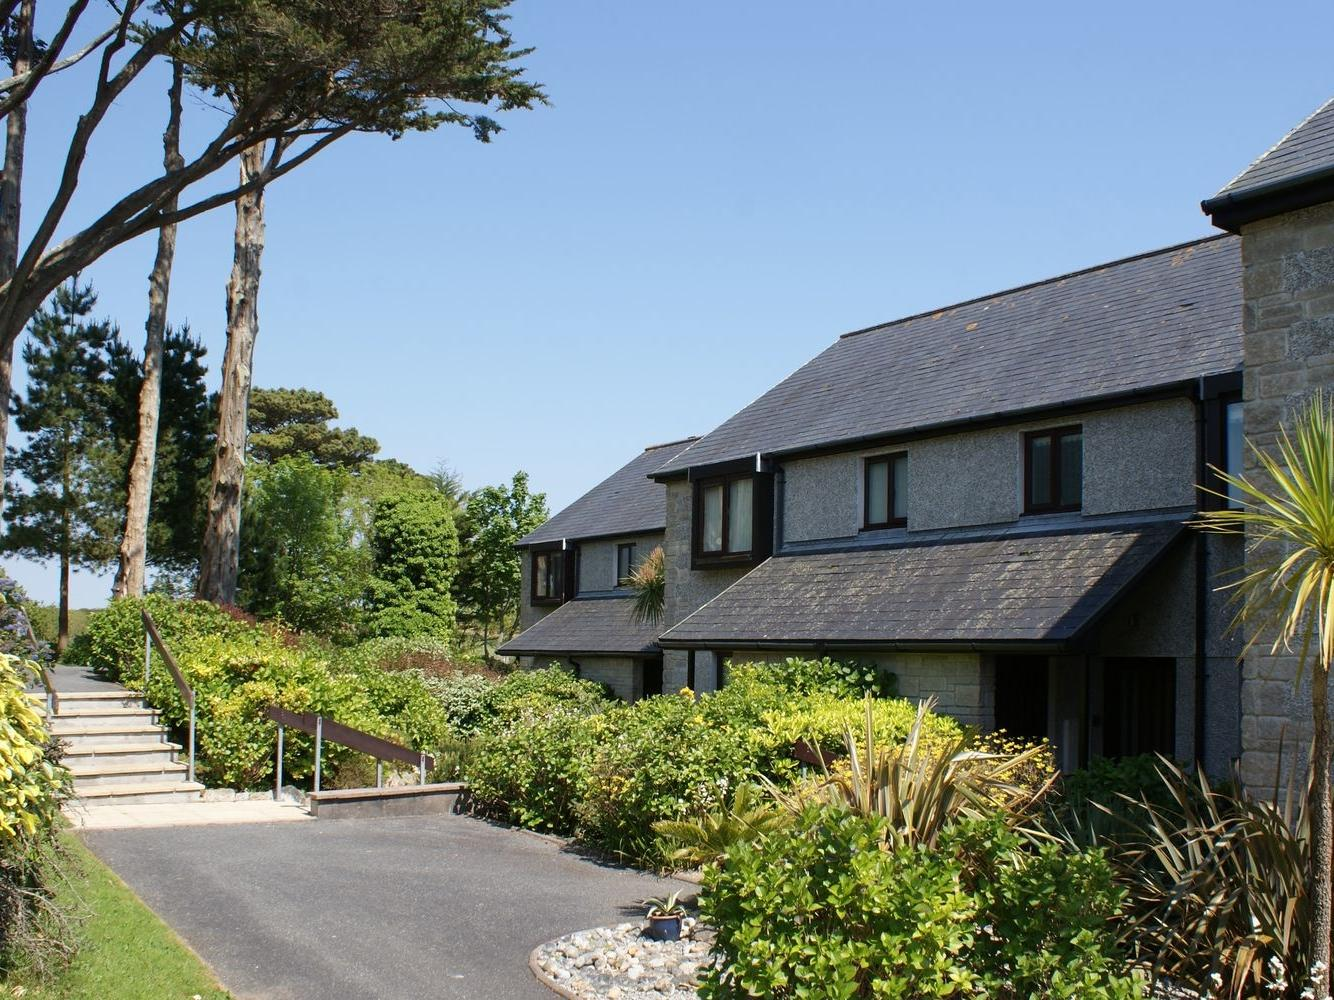 No 65 Lower Maen Cottages